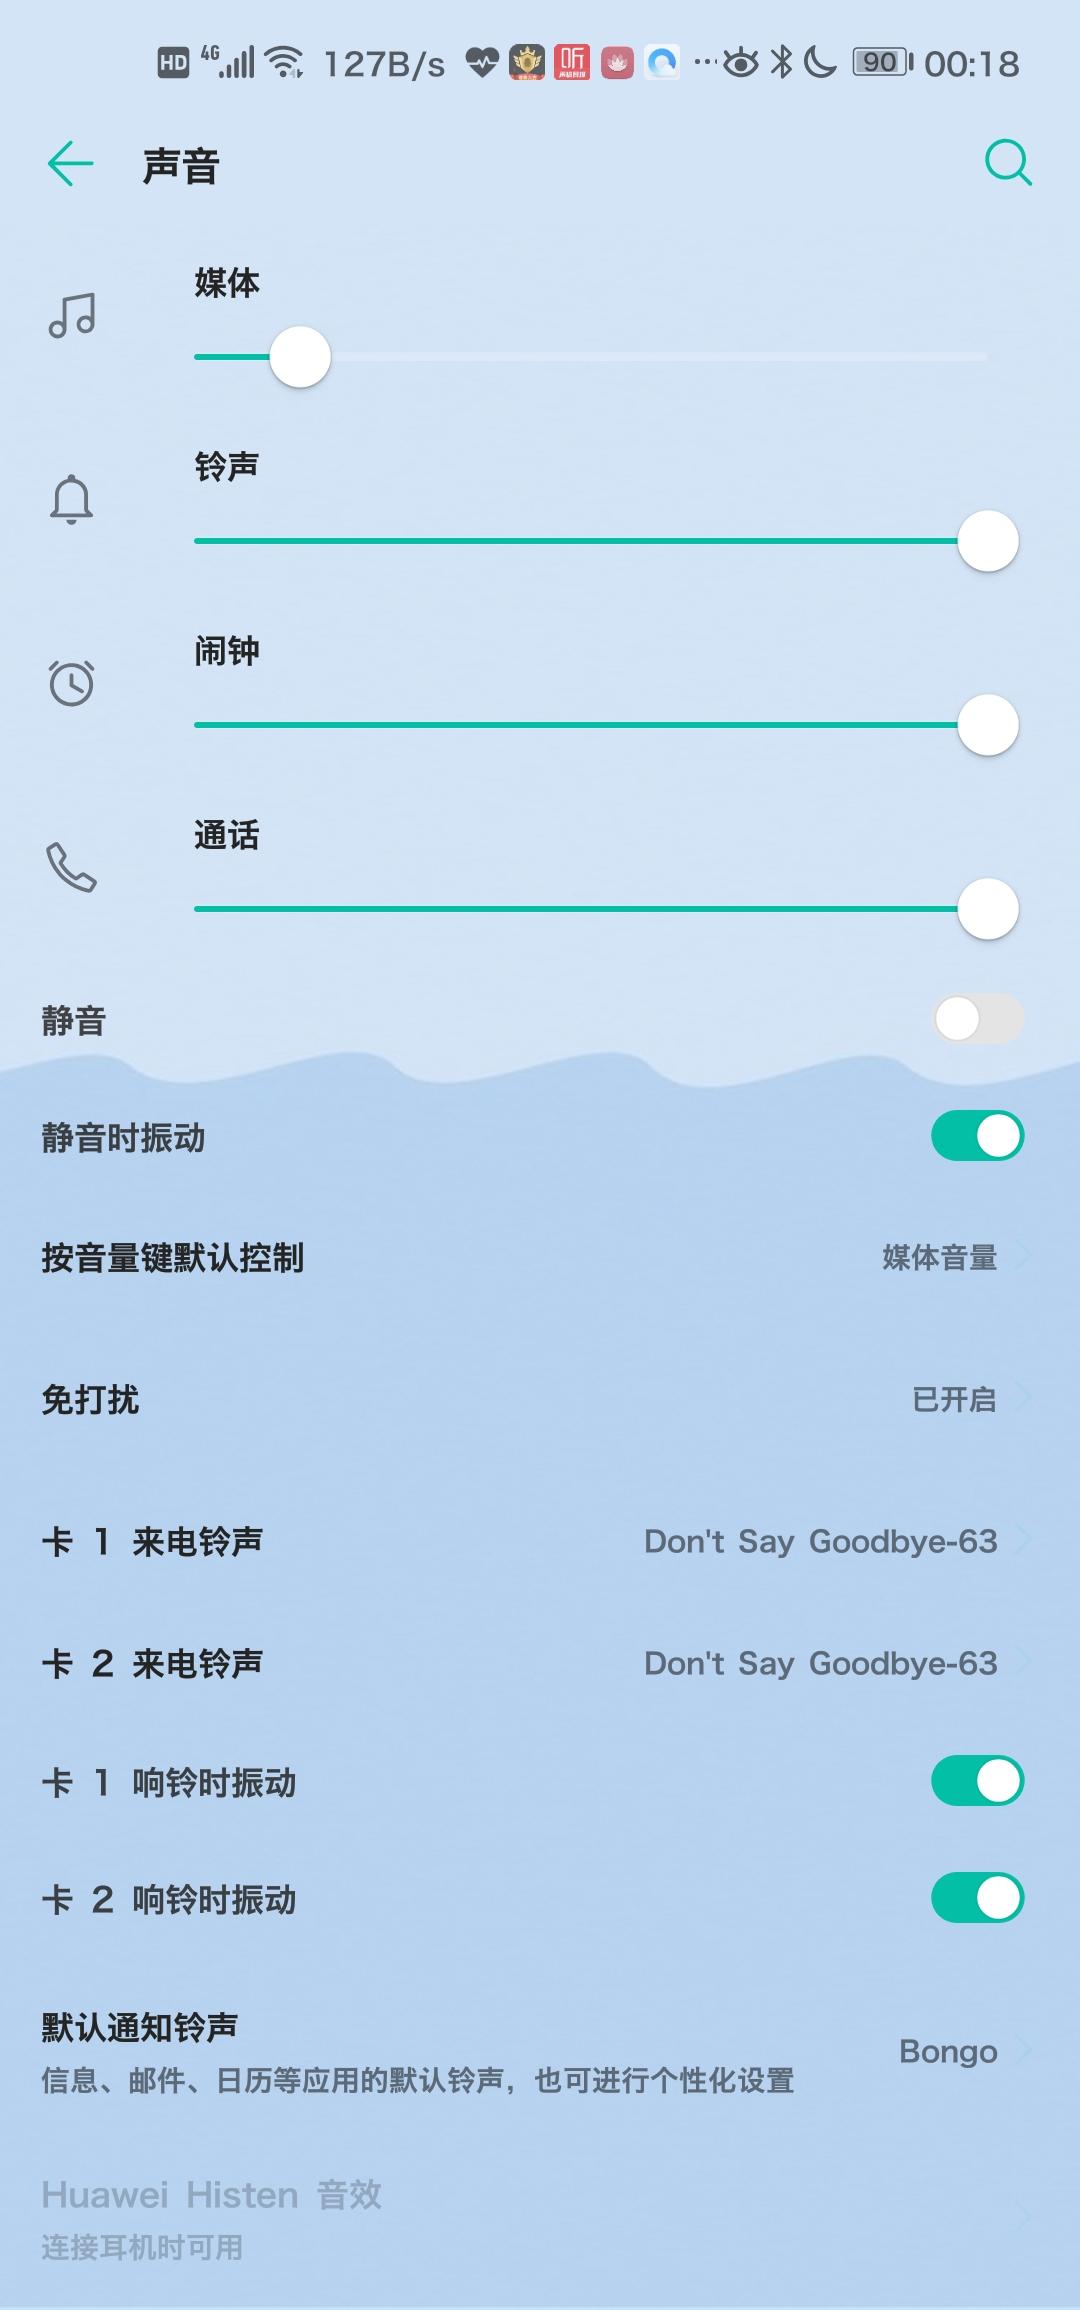 Screenshot_20190216_001844_com.android.settings.jpg